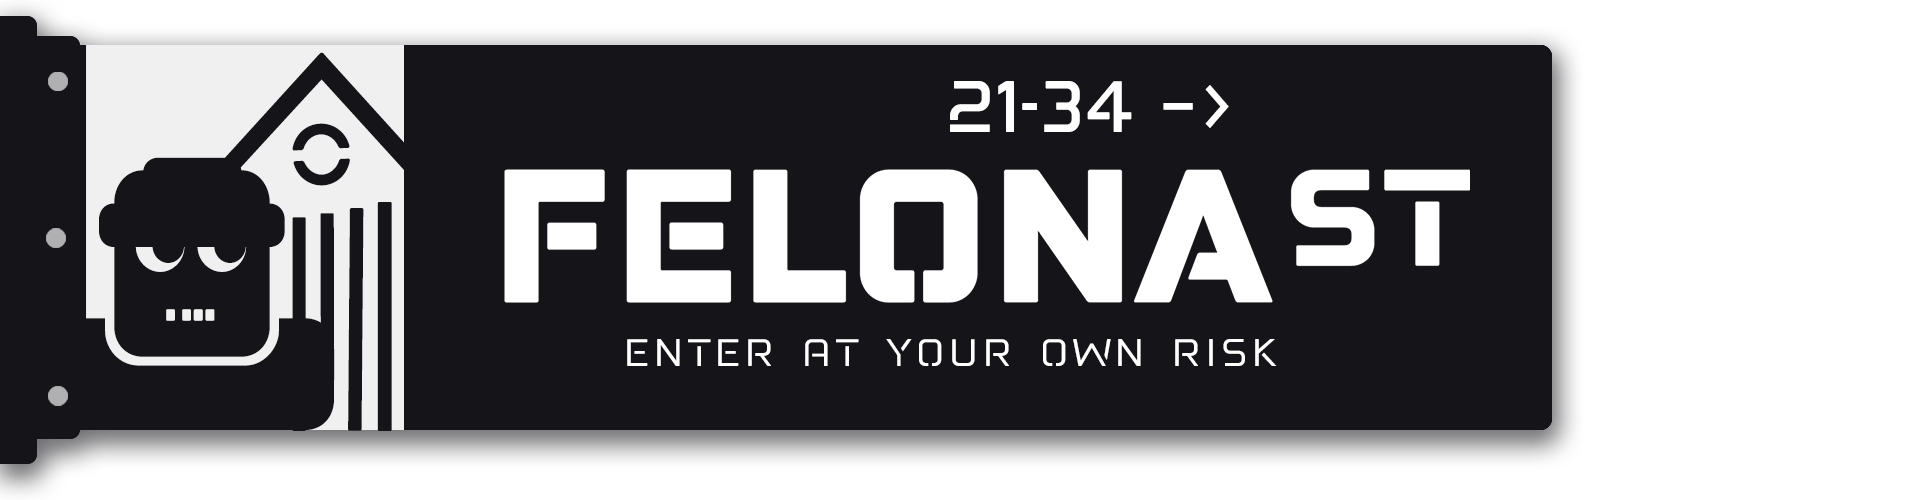 Felona street. Enter at your own risk.